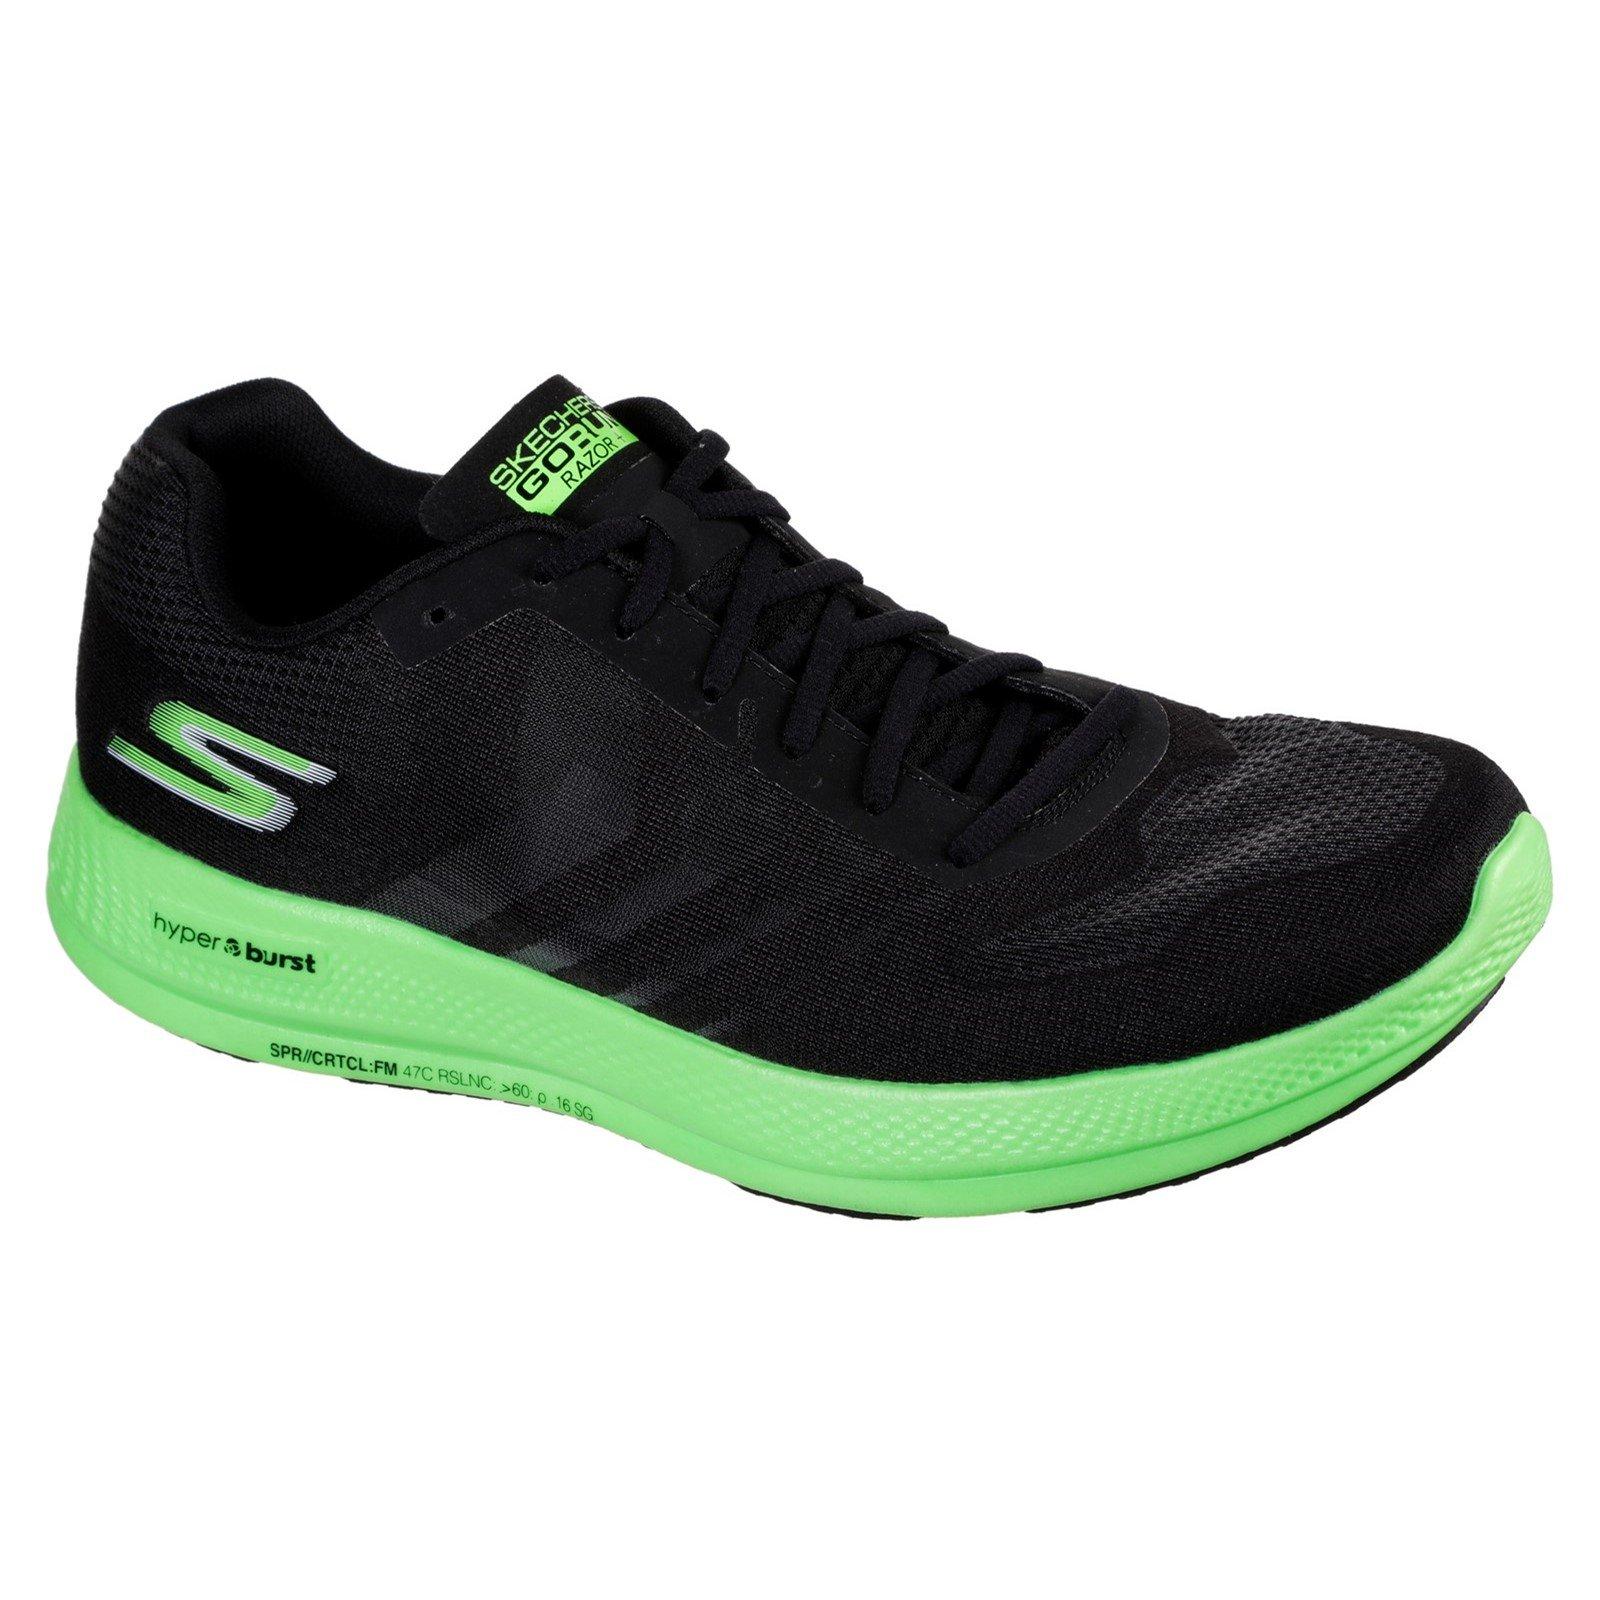 Skechers Men's Go Run Razor Trainer Multicolor 32699 - Black/Green 8